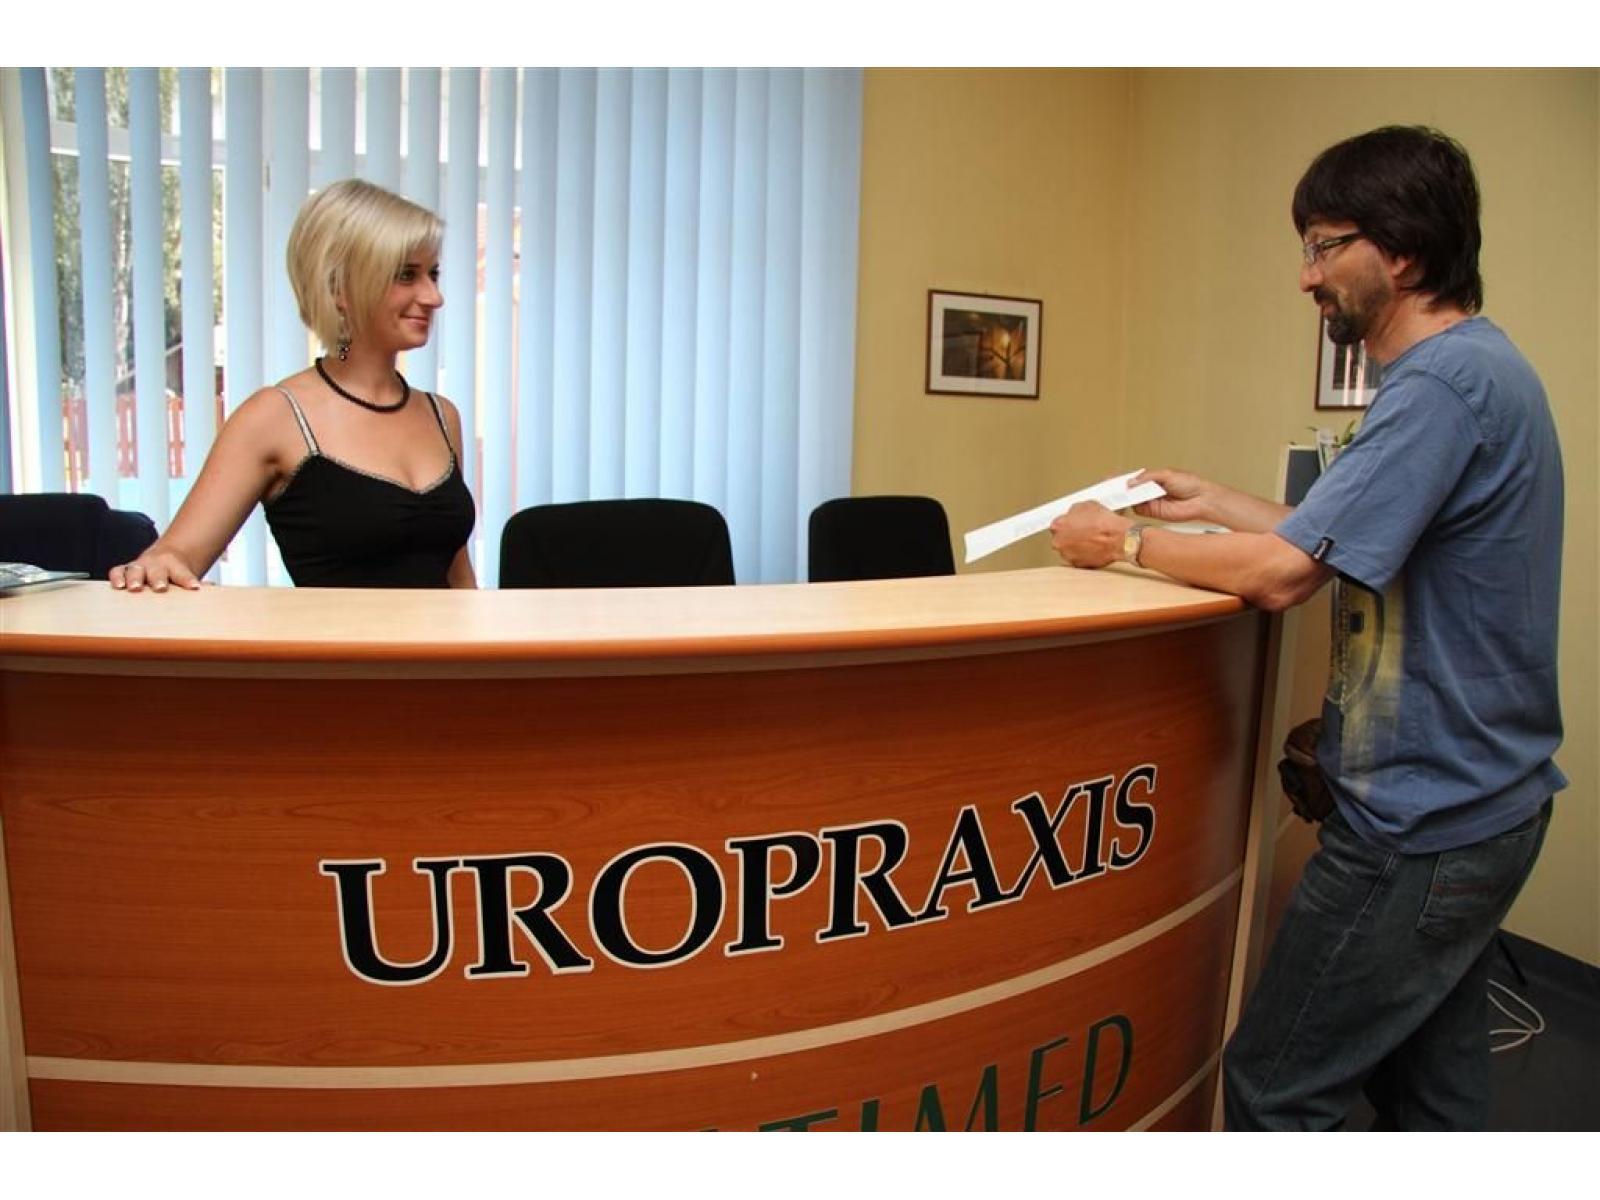 Uropraxis - 1_(10).jpg